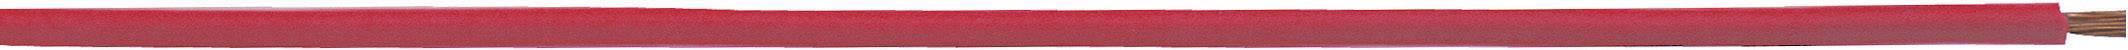 Opletenie / lanko LappKabel 4510032S H05V-K, 1 x 0.75 mm², vonkajší Ø 2.70 mm, 250 m, hnedá